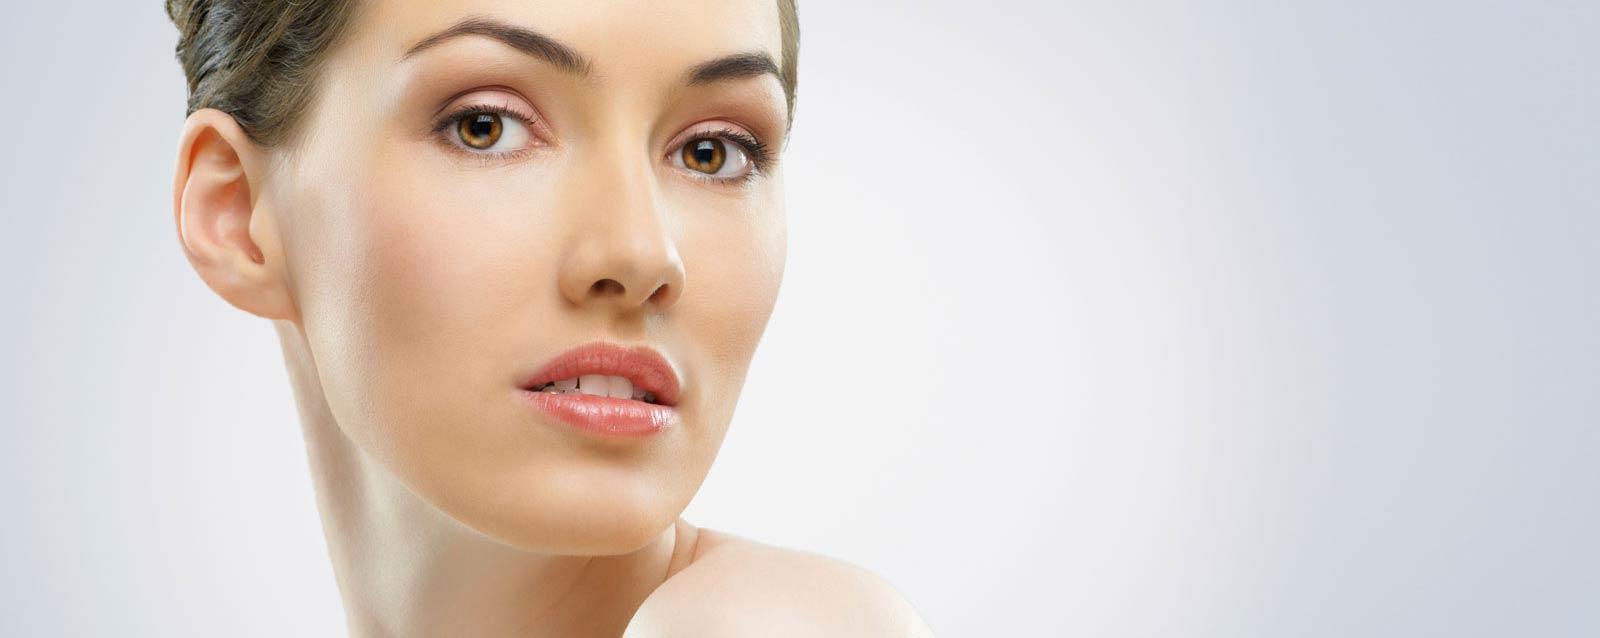 Protocolo: Microagulhamento Facial Programa Rejuvenescedor